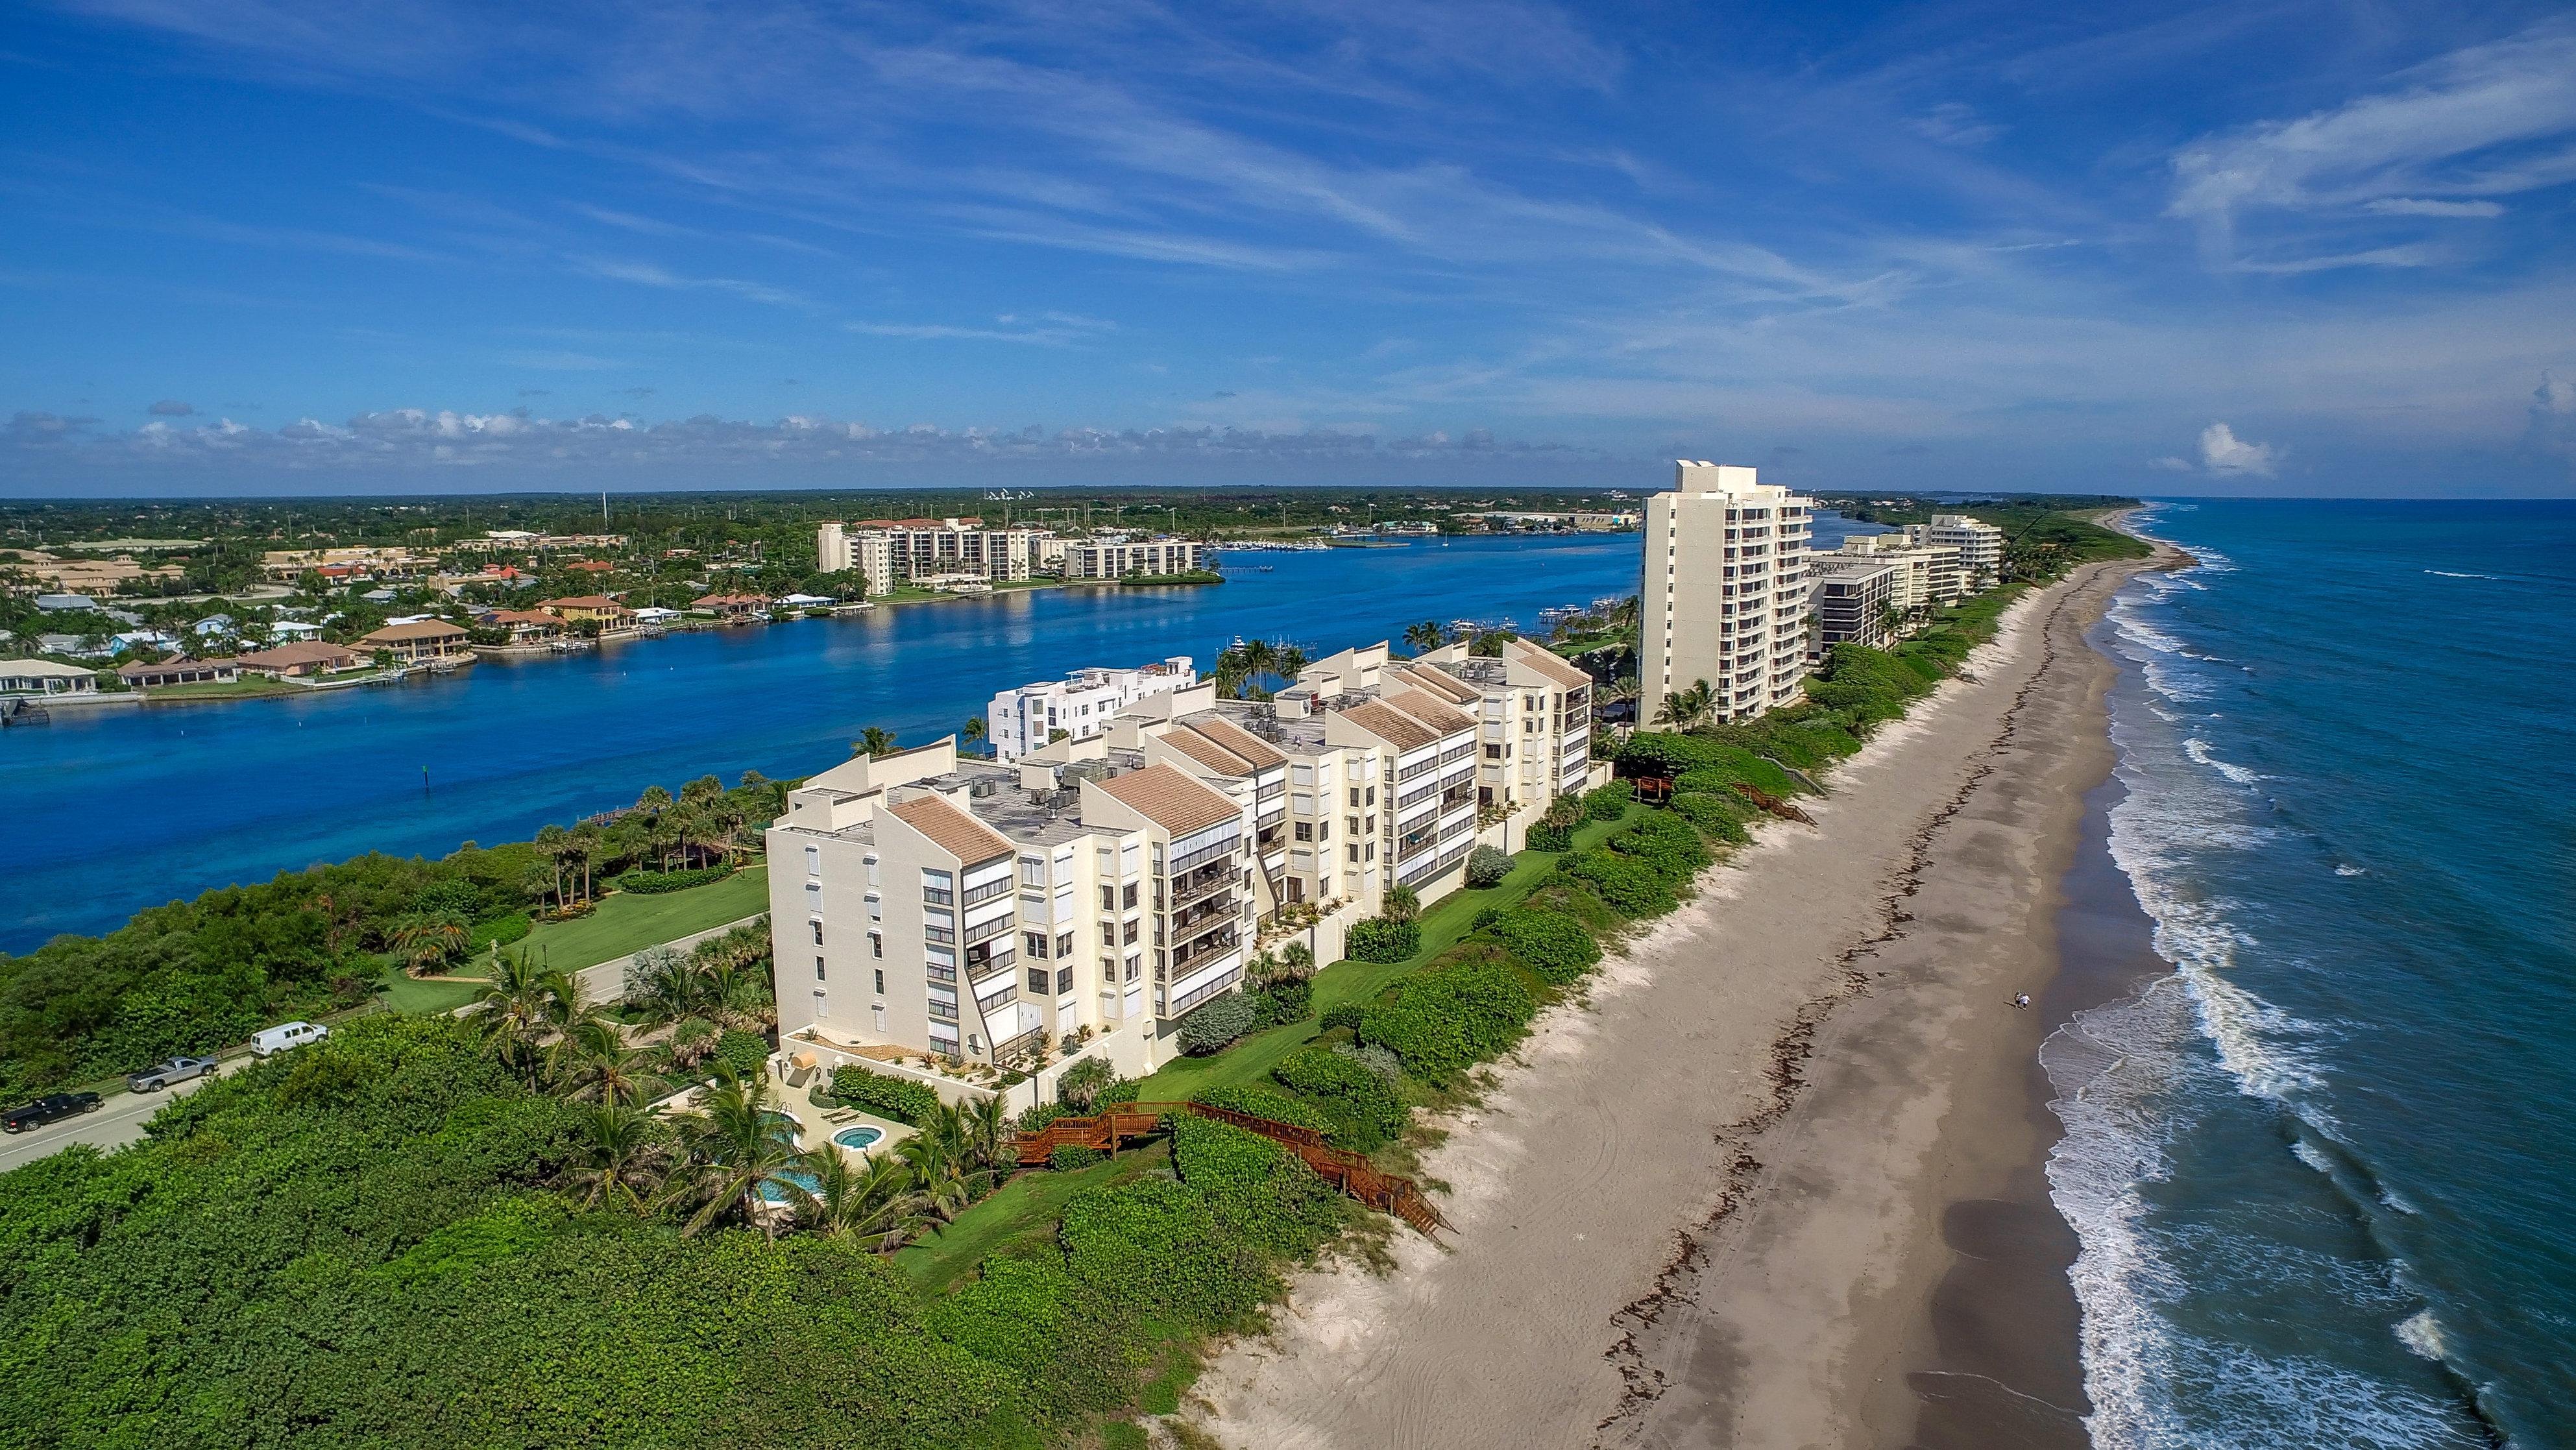 Nhà chung cư vì Bán tại 19670 Beach Road A515 Tequesta, Florida, 33469 Hoa Kỳ